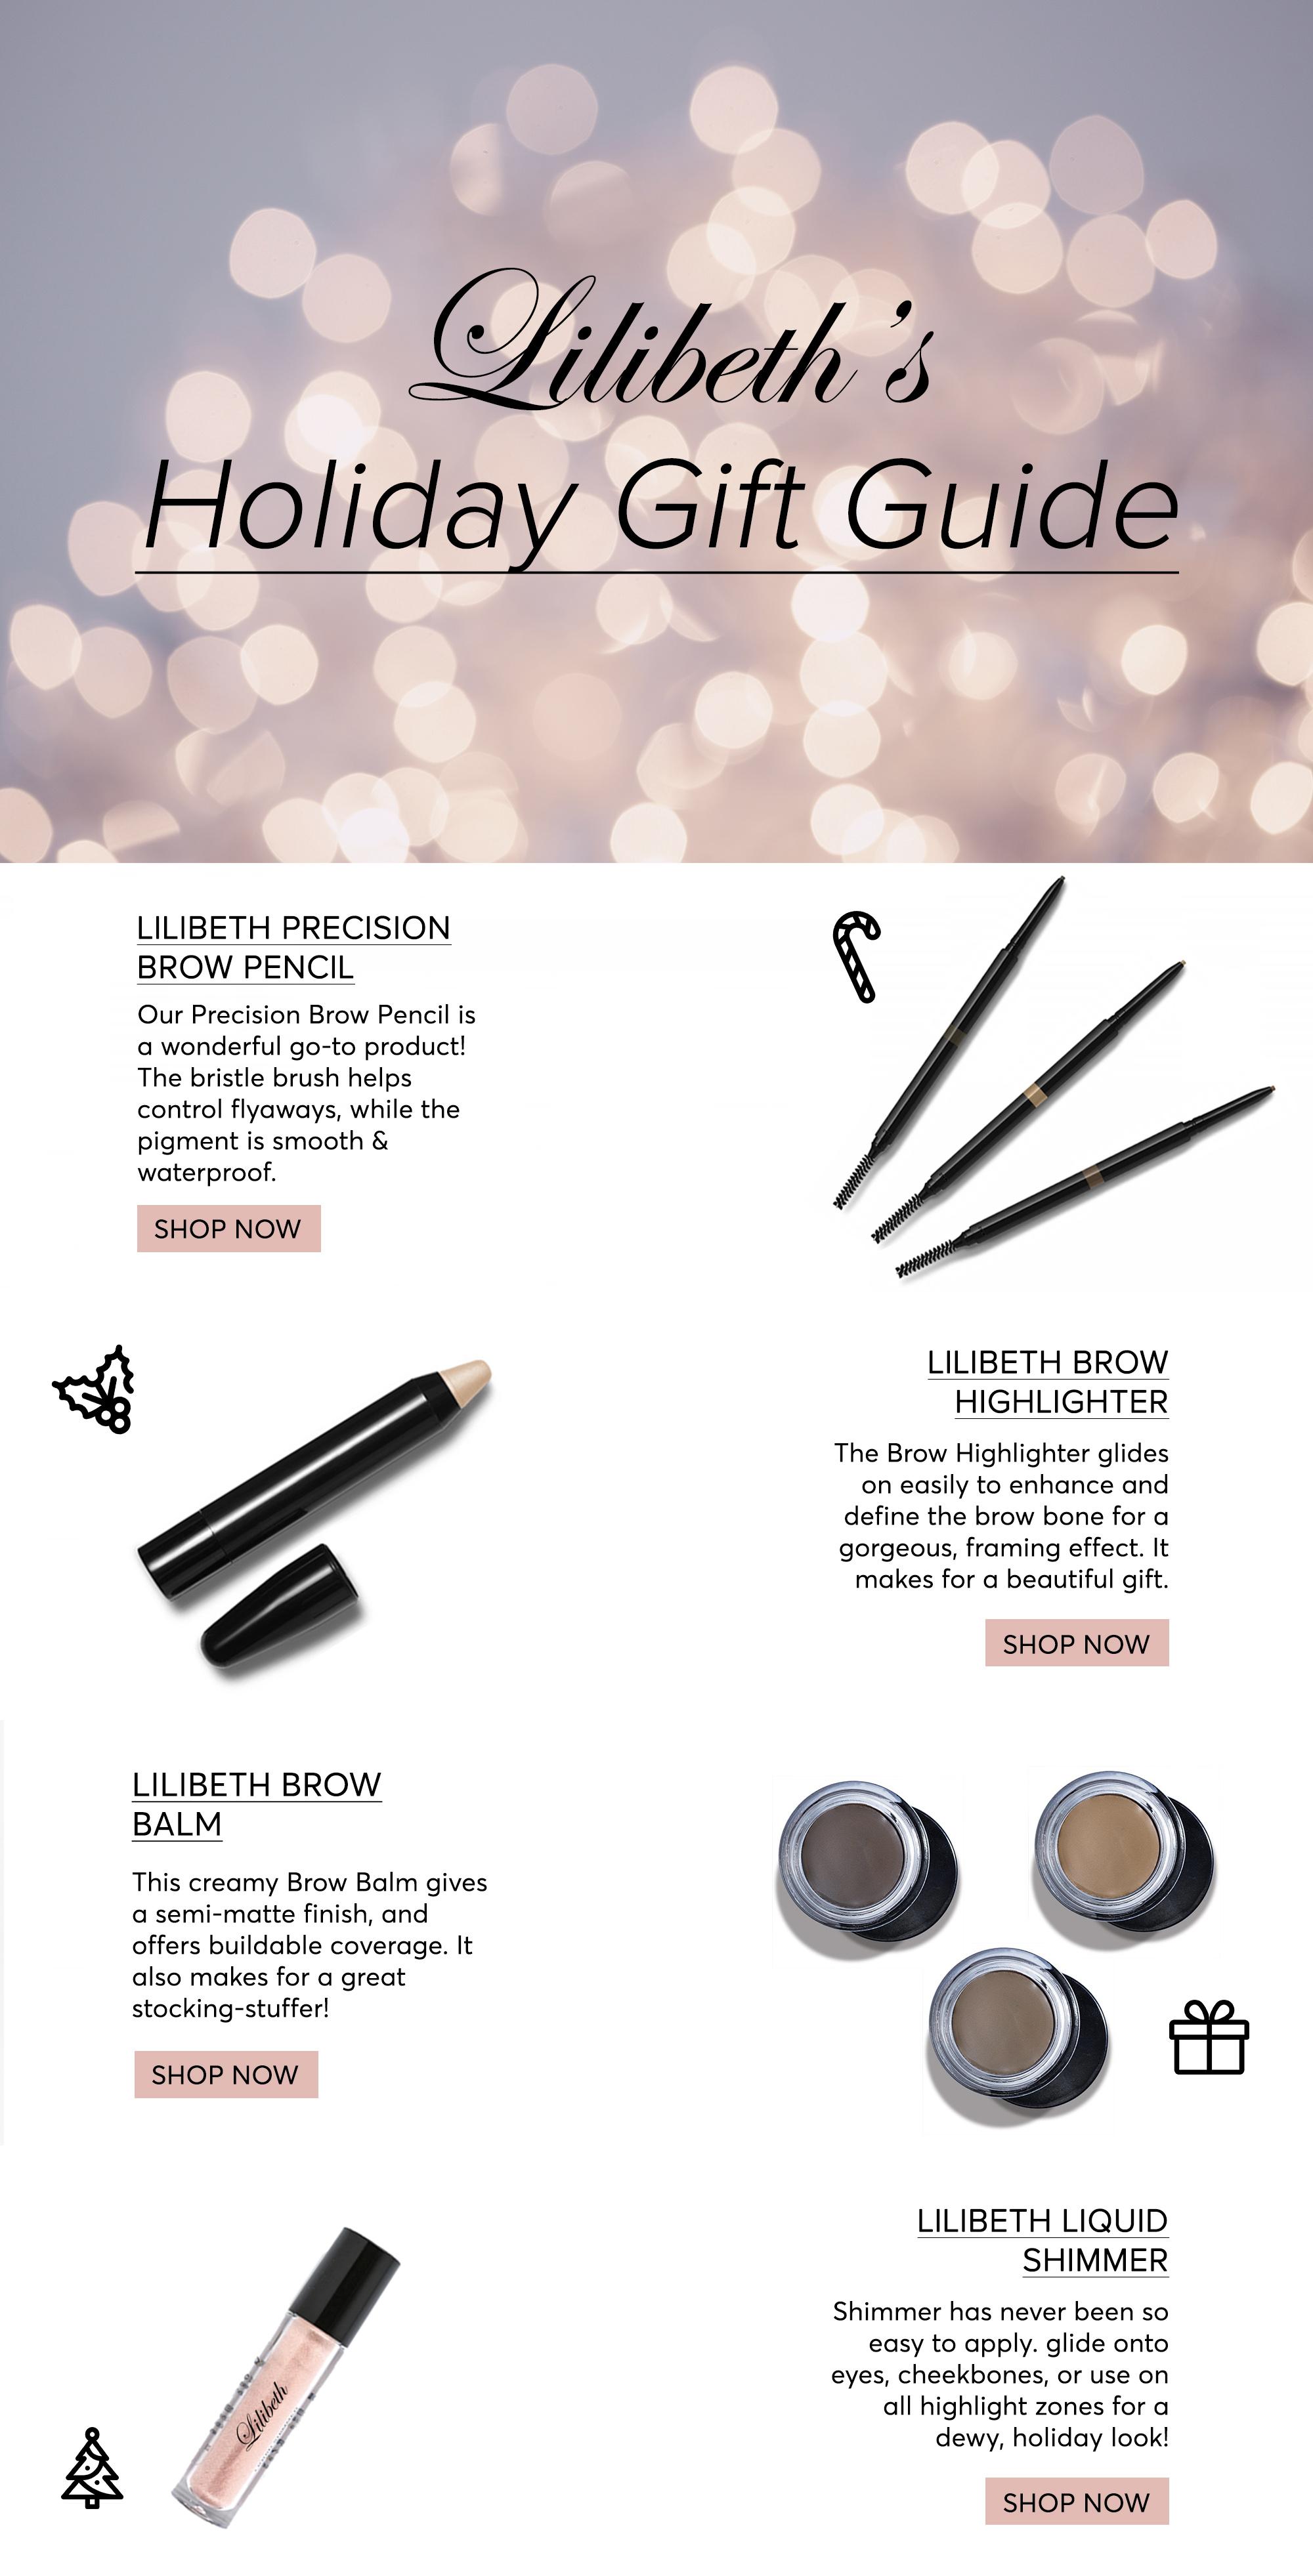 Lilibeth Holiday Gift Guide B4.jpg